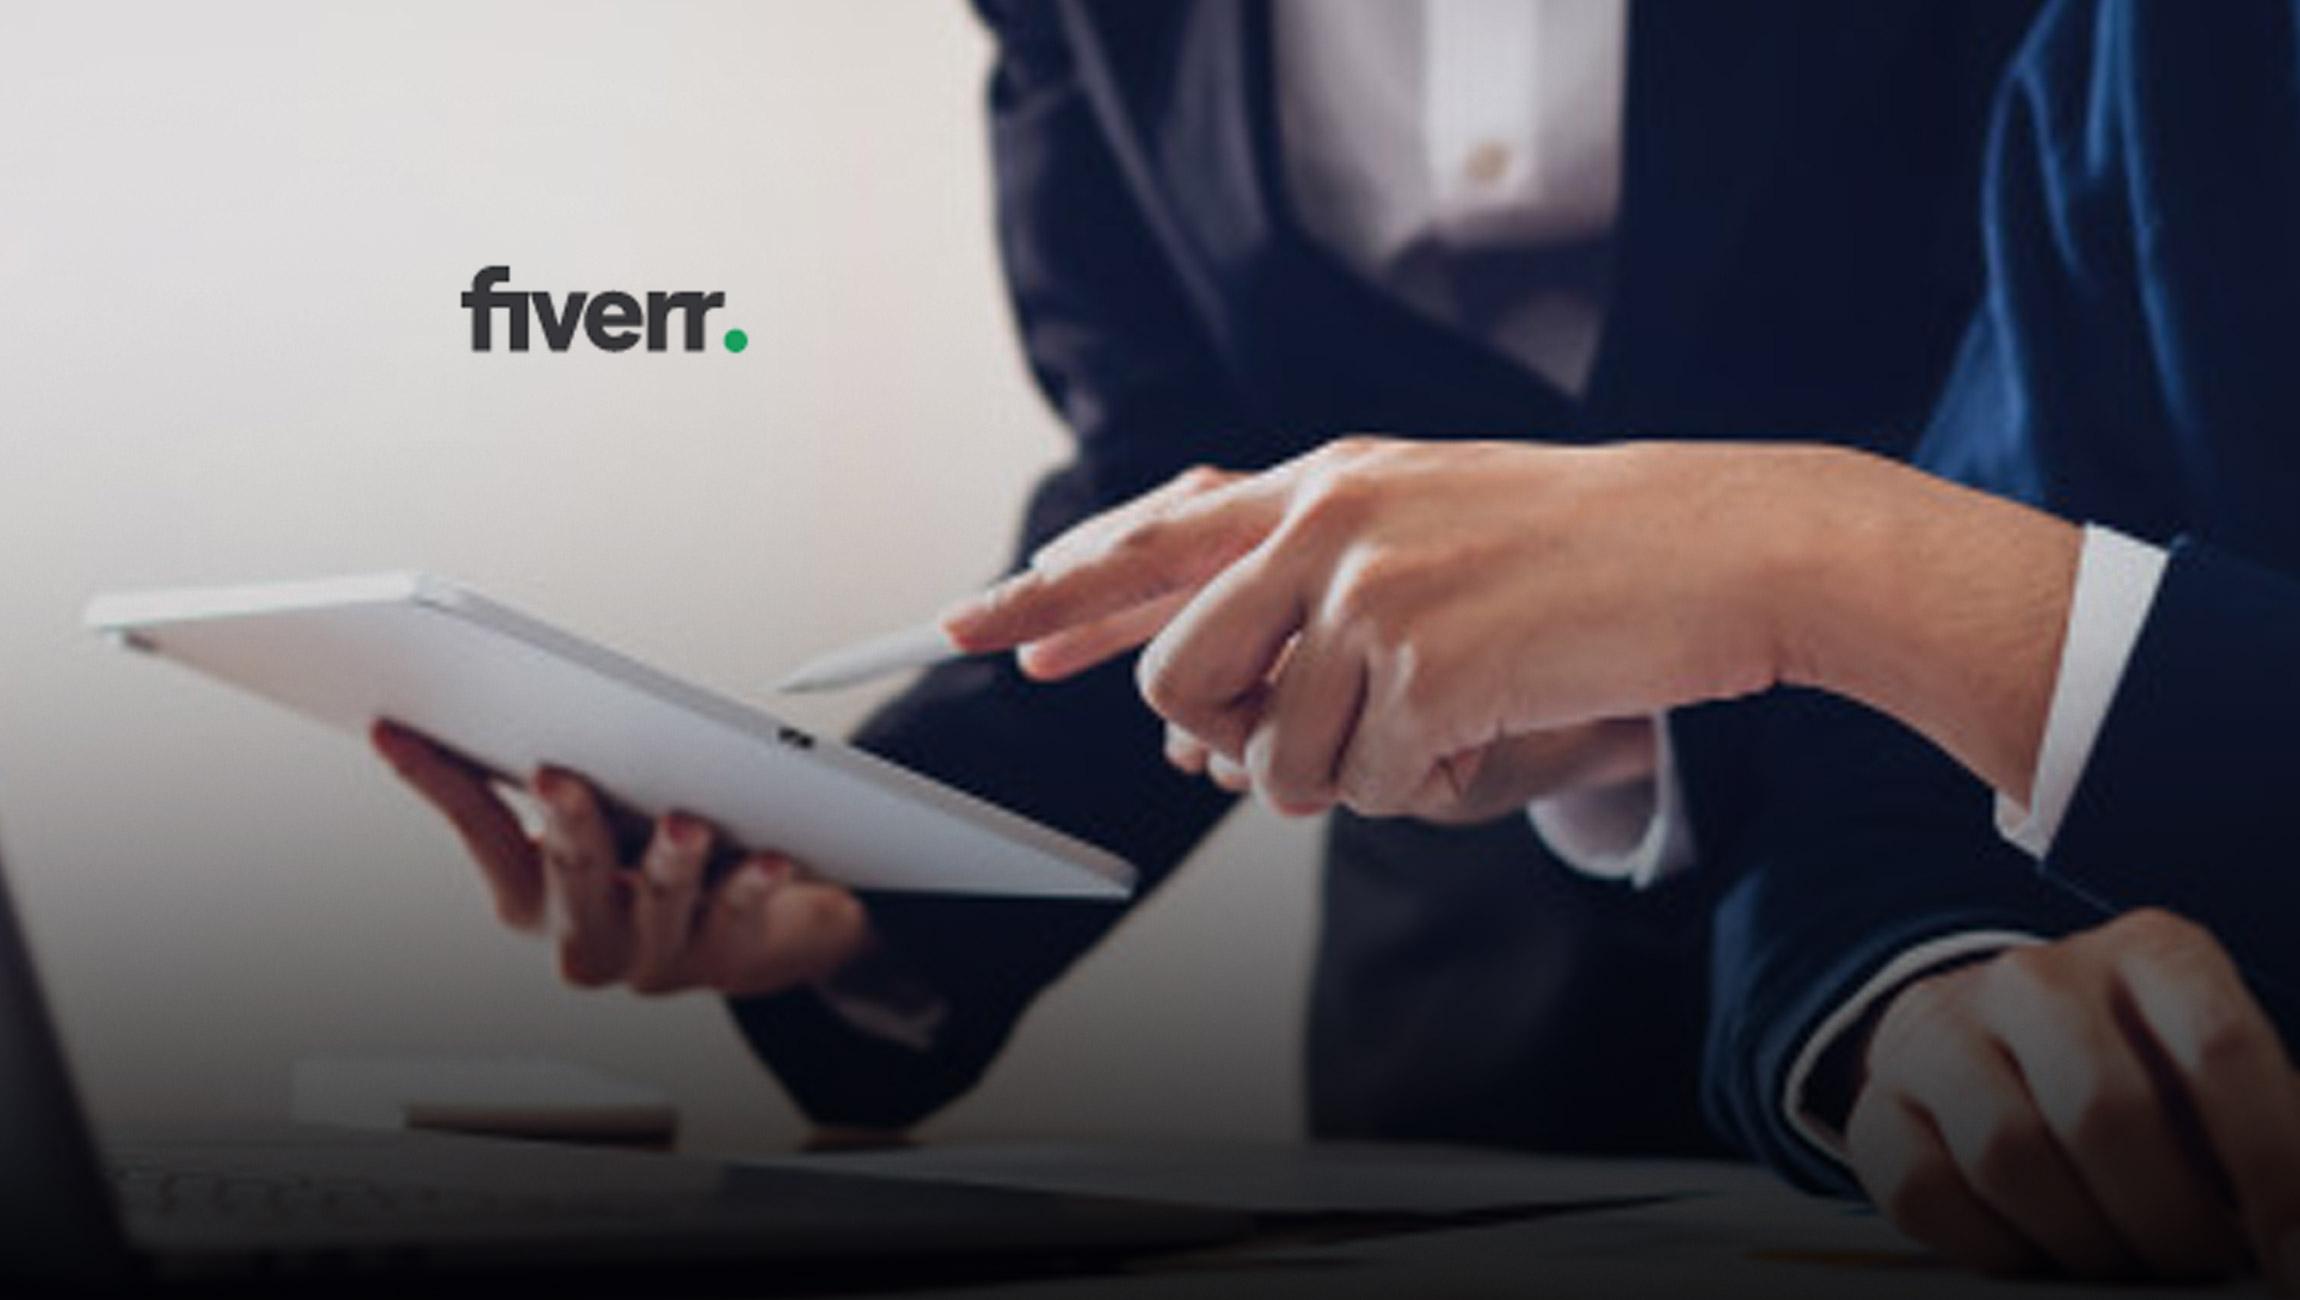 Fiverr Announces Inaugural Future Collective, a Business Accelerator Fellowship for Black Entrepreneurs